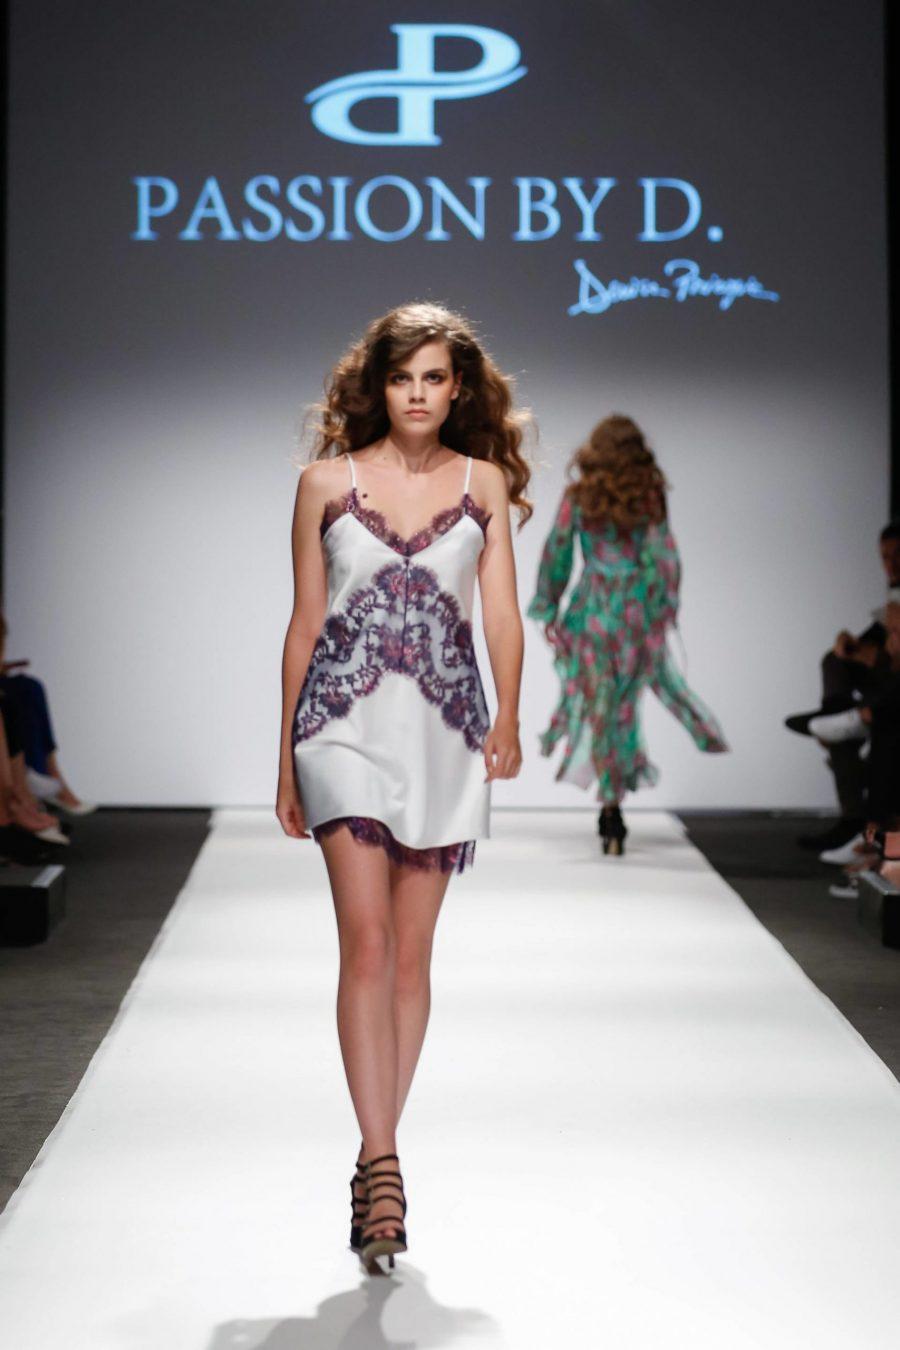 slip dress Fashion Show Vienna Fashion week 2019 - Passion by D